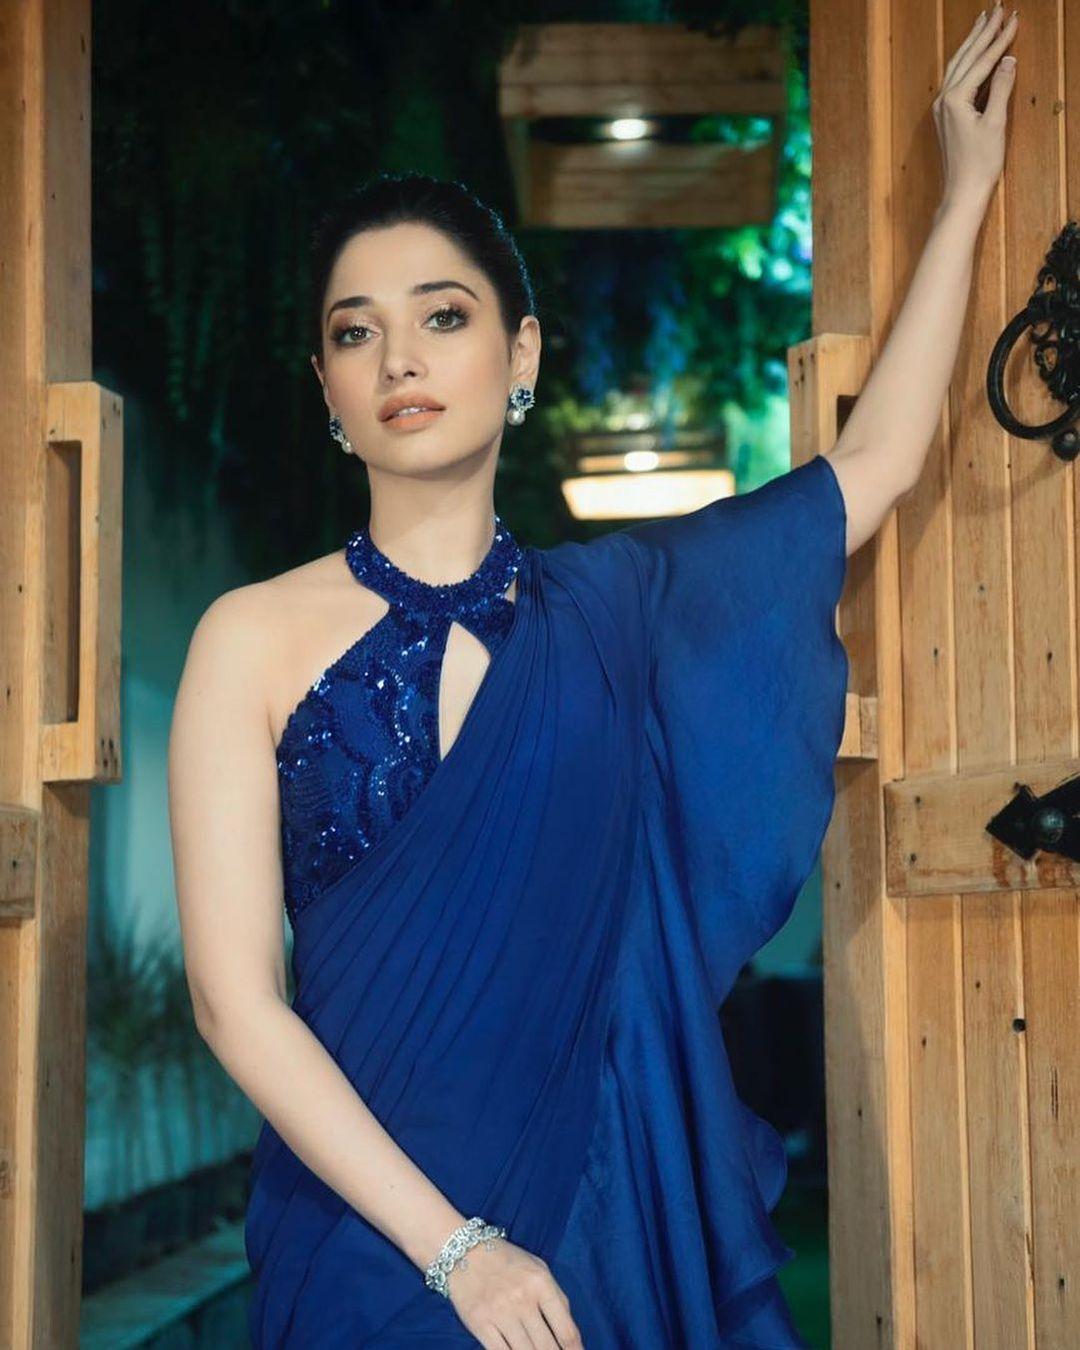 Stunning actress Tammanna Bhatia in blue ruffle saree with halter neck blouse. 2021-09-18